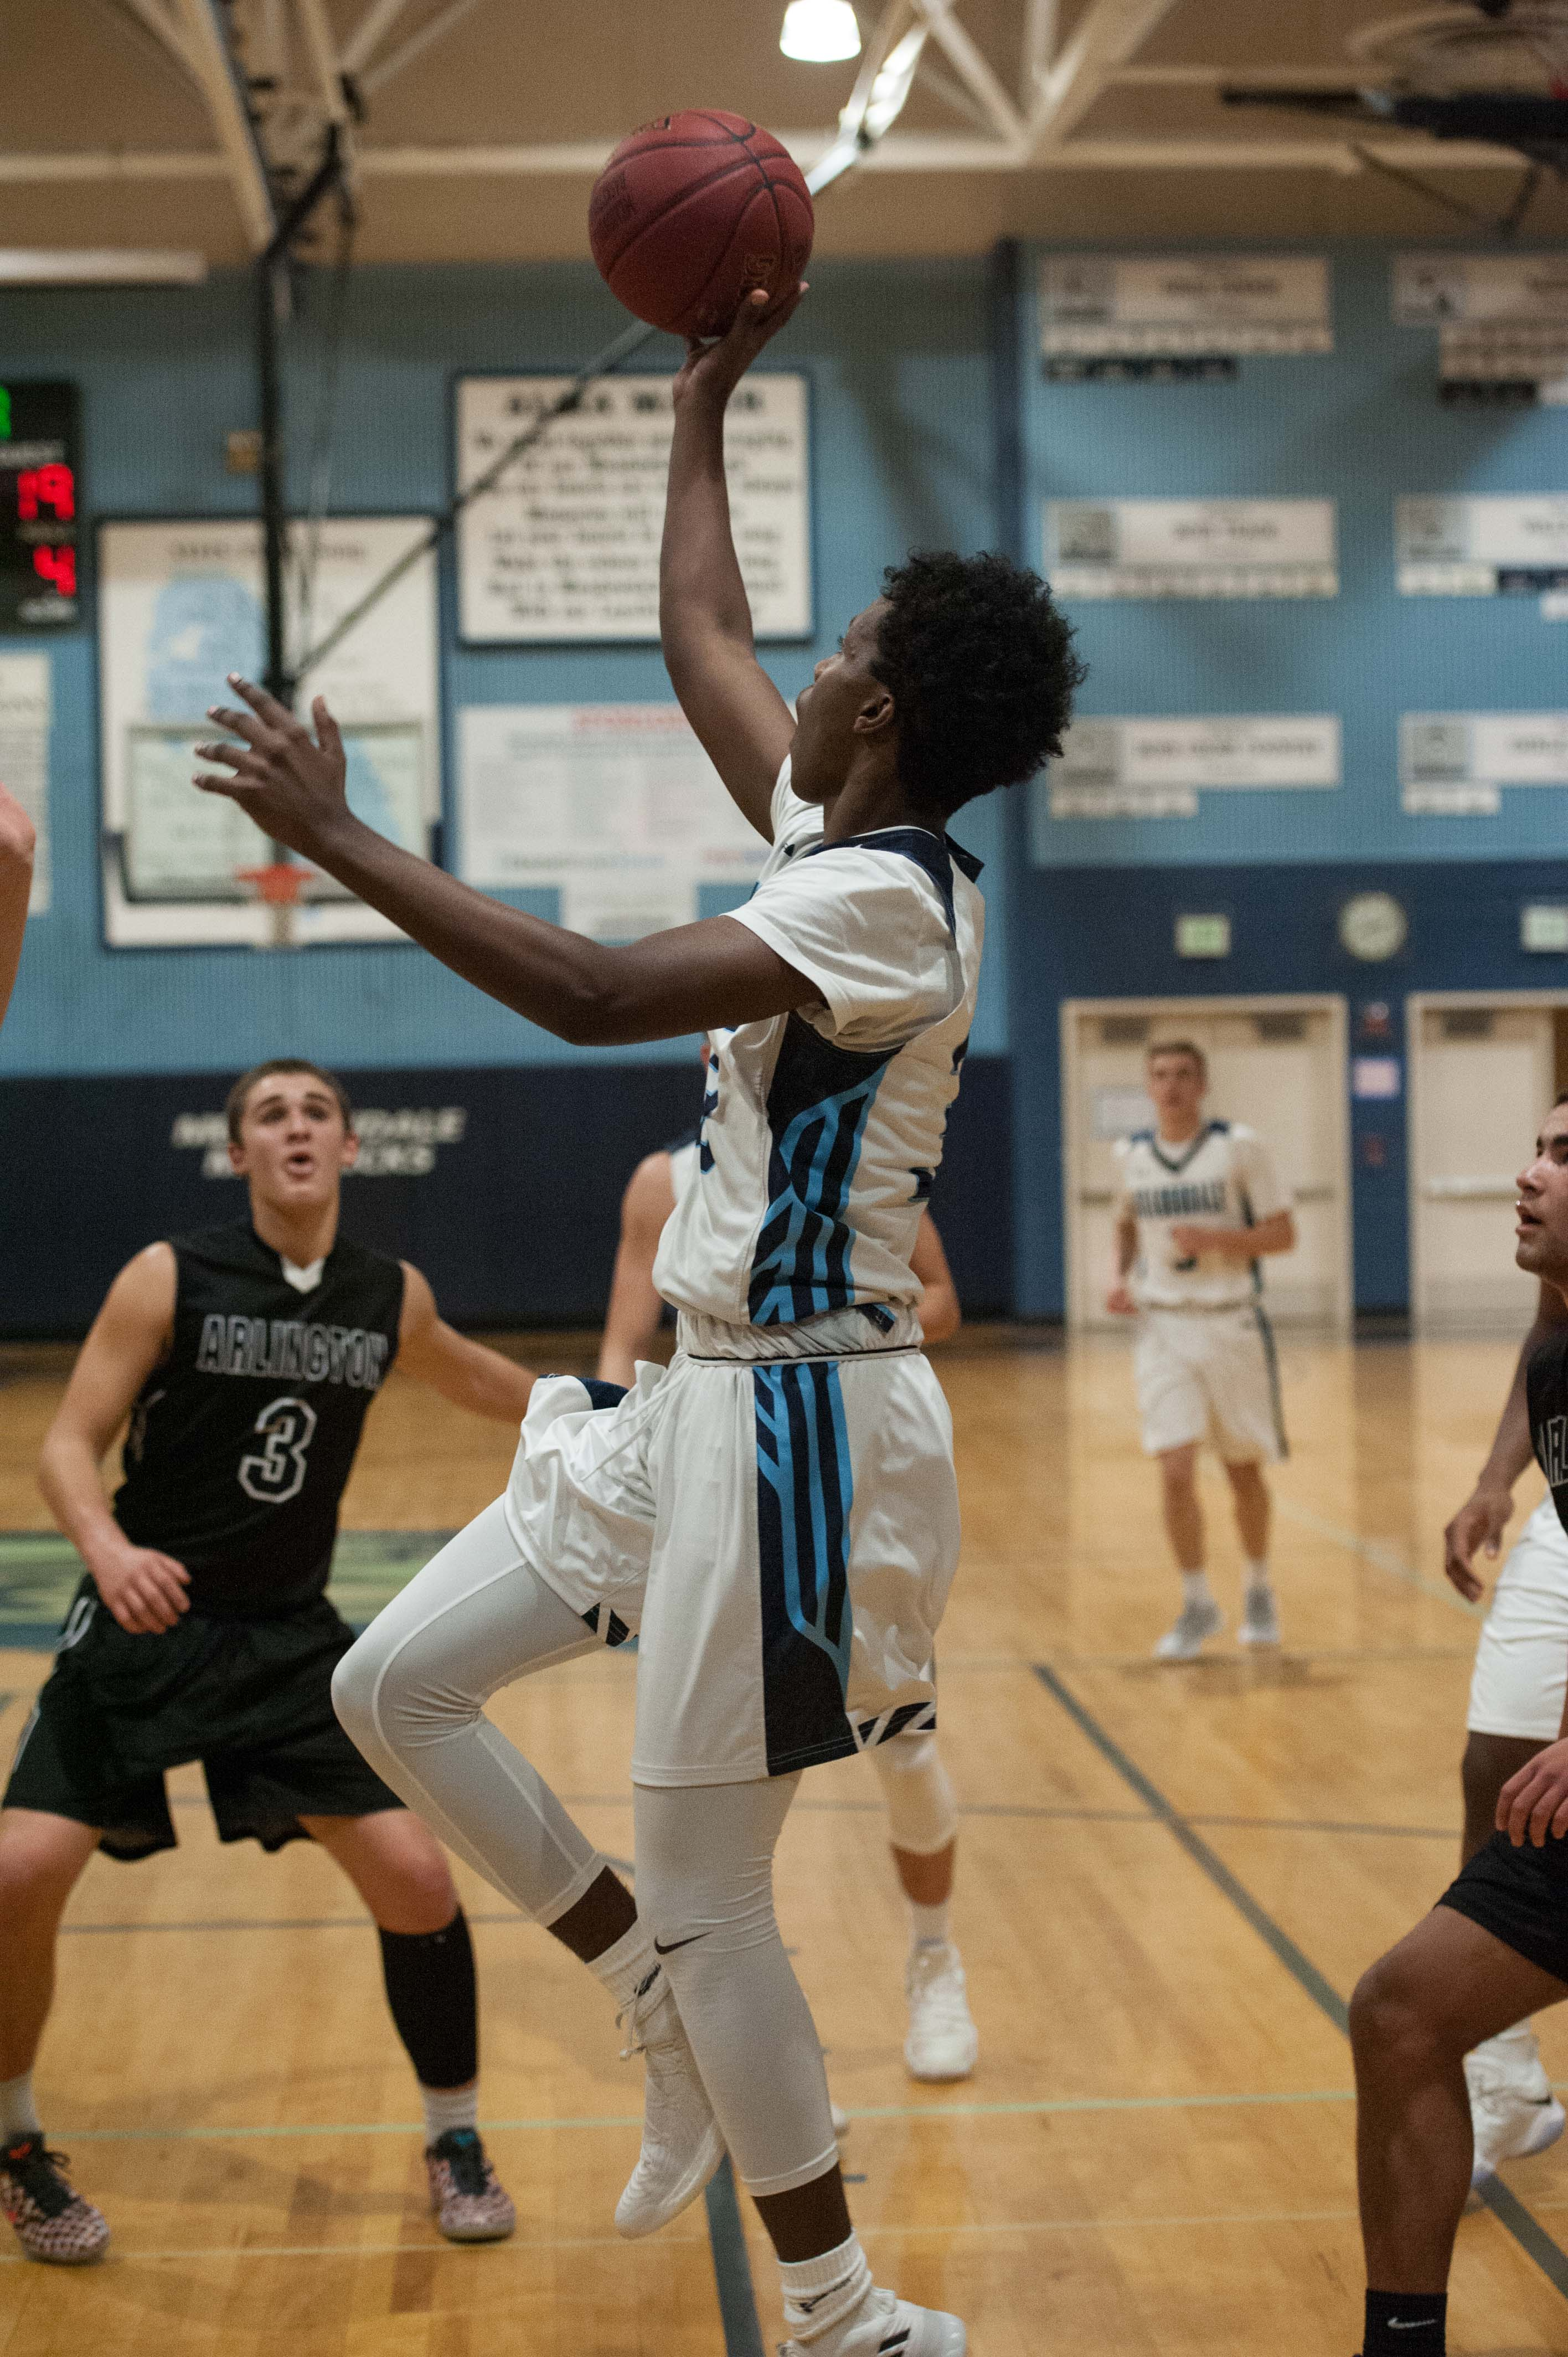 Prep Boys Basketball Photo Gallery Mavs Fall To Eagles